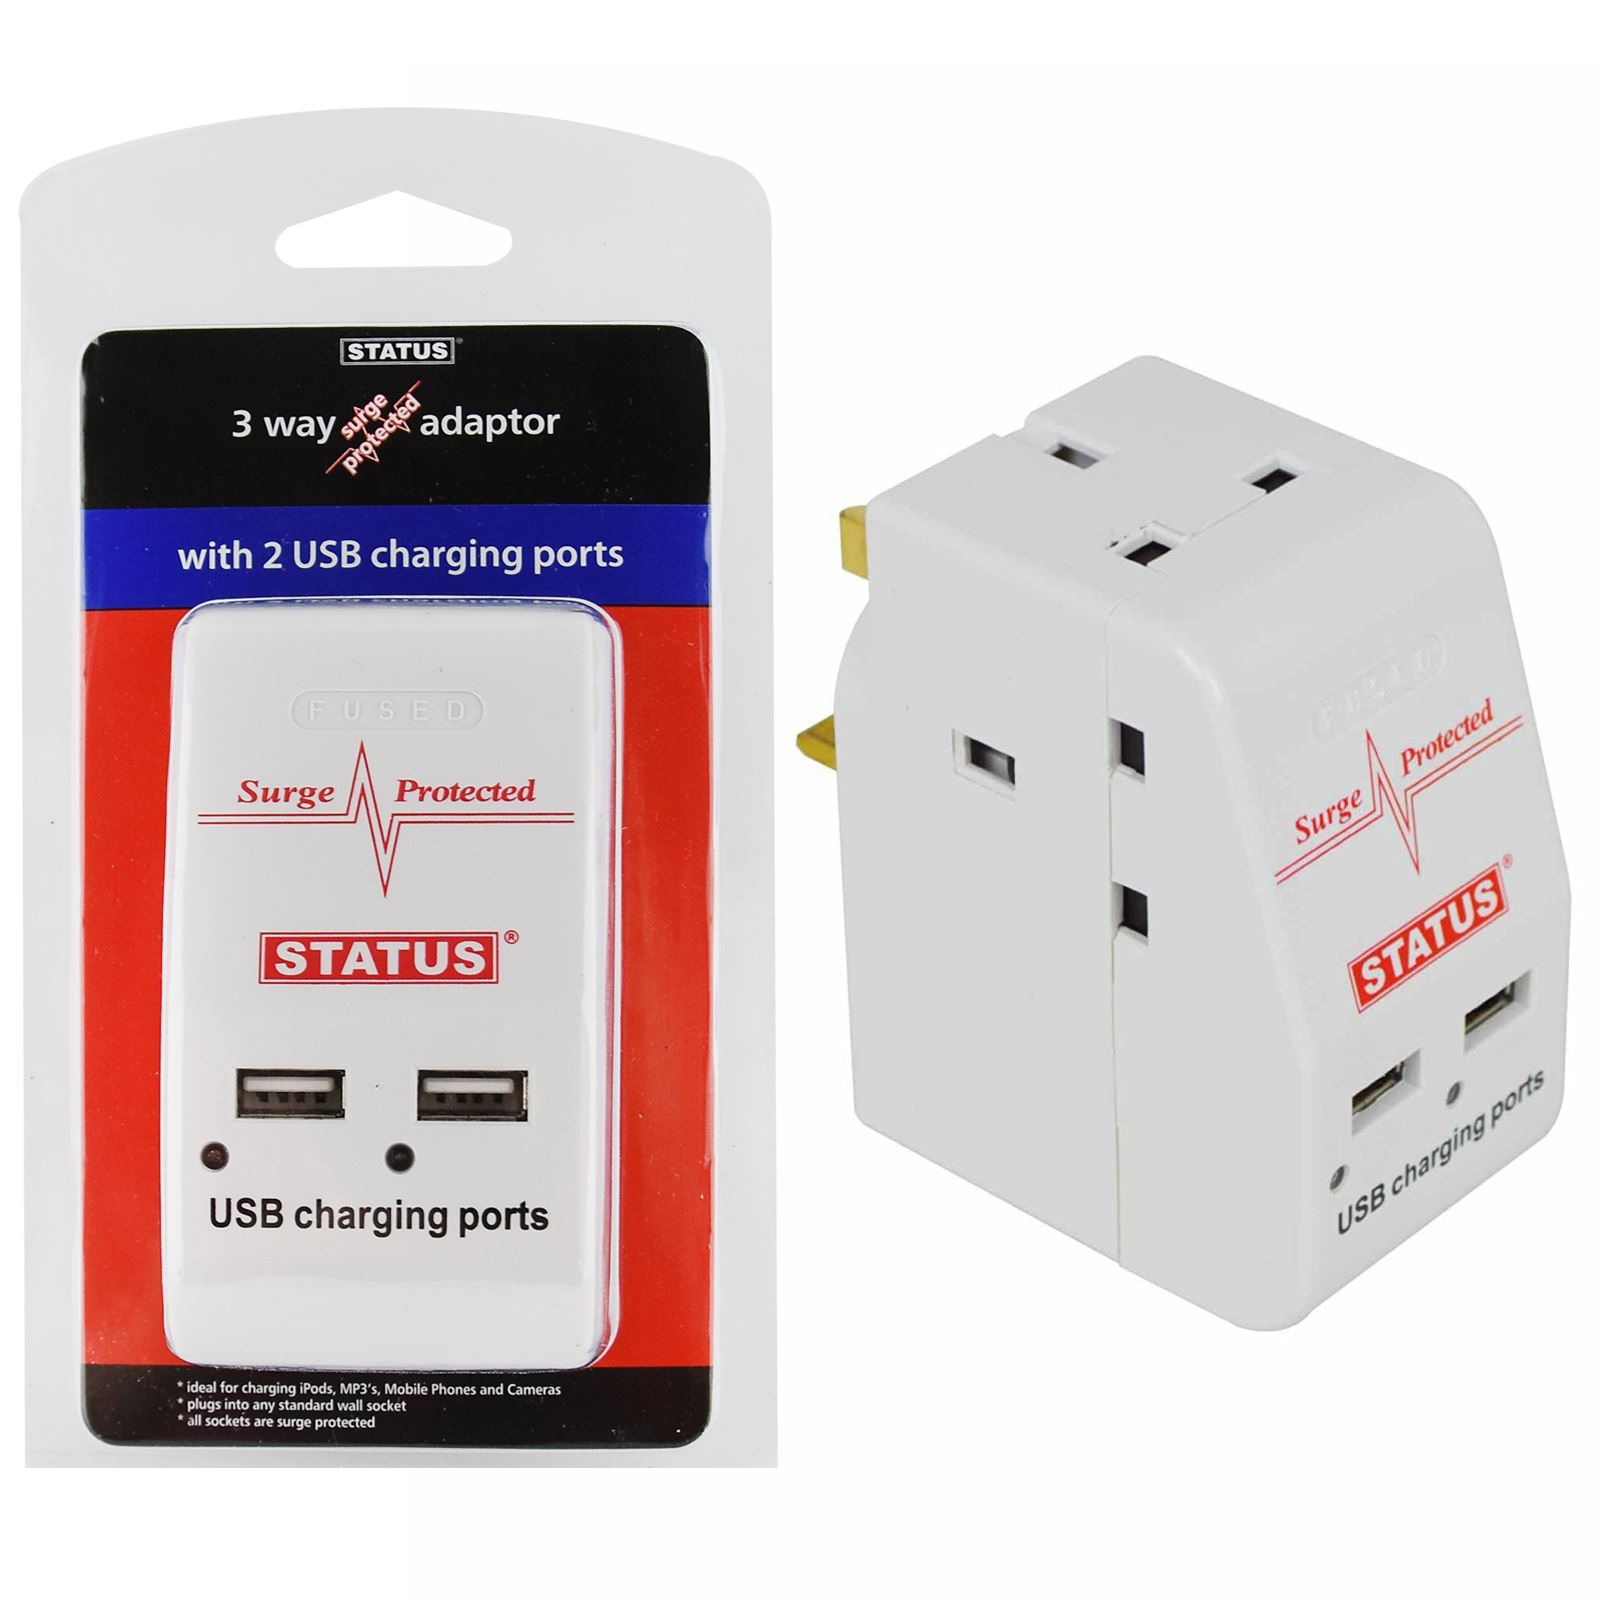 6 way extension lead 3m 2004 suzuki eiger 400 wiring diagram multi plug 2 3 4 5 gang uk mains socket